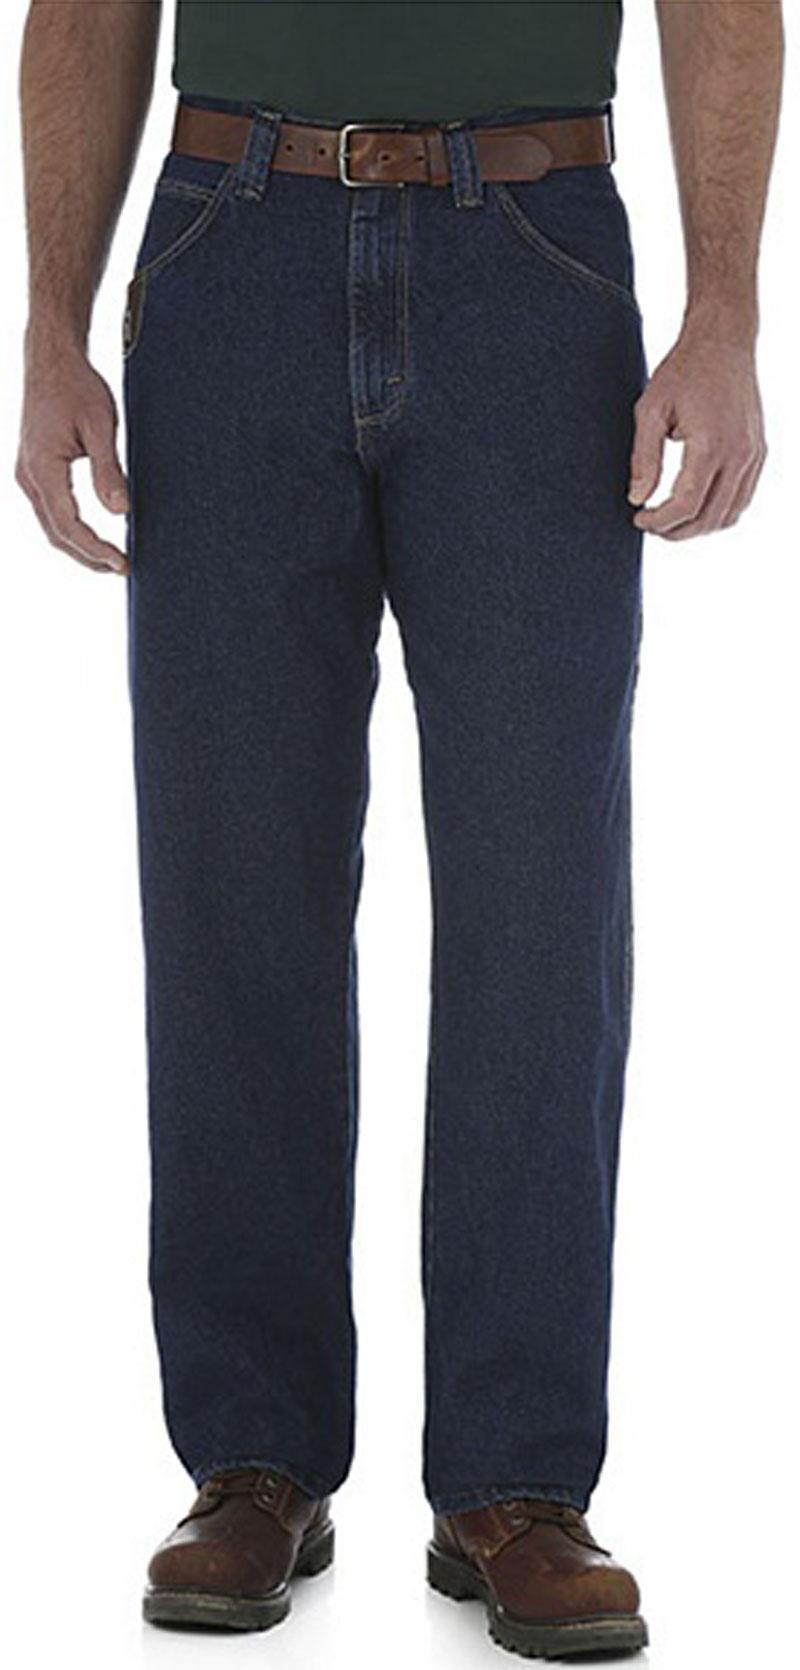 Wrangler® Riggs Workwear® Five Pocket Jean